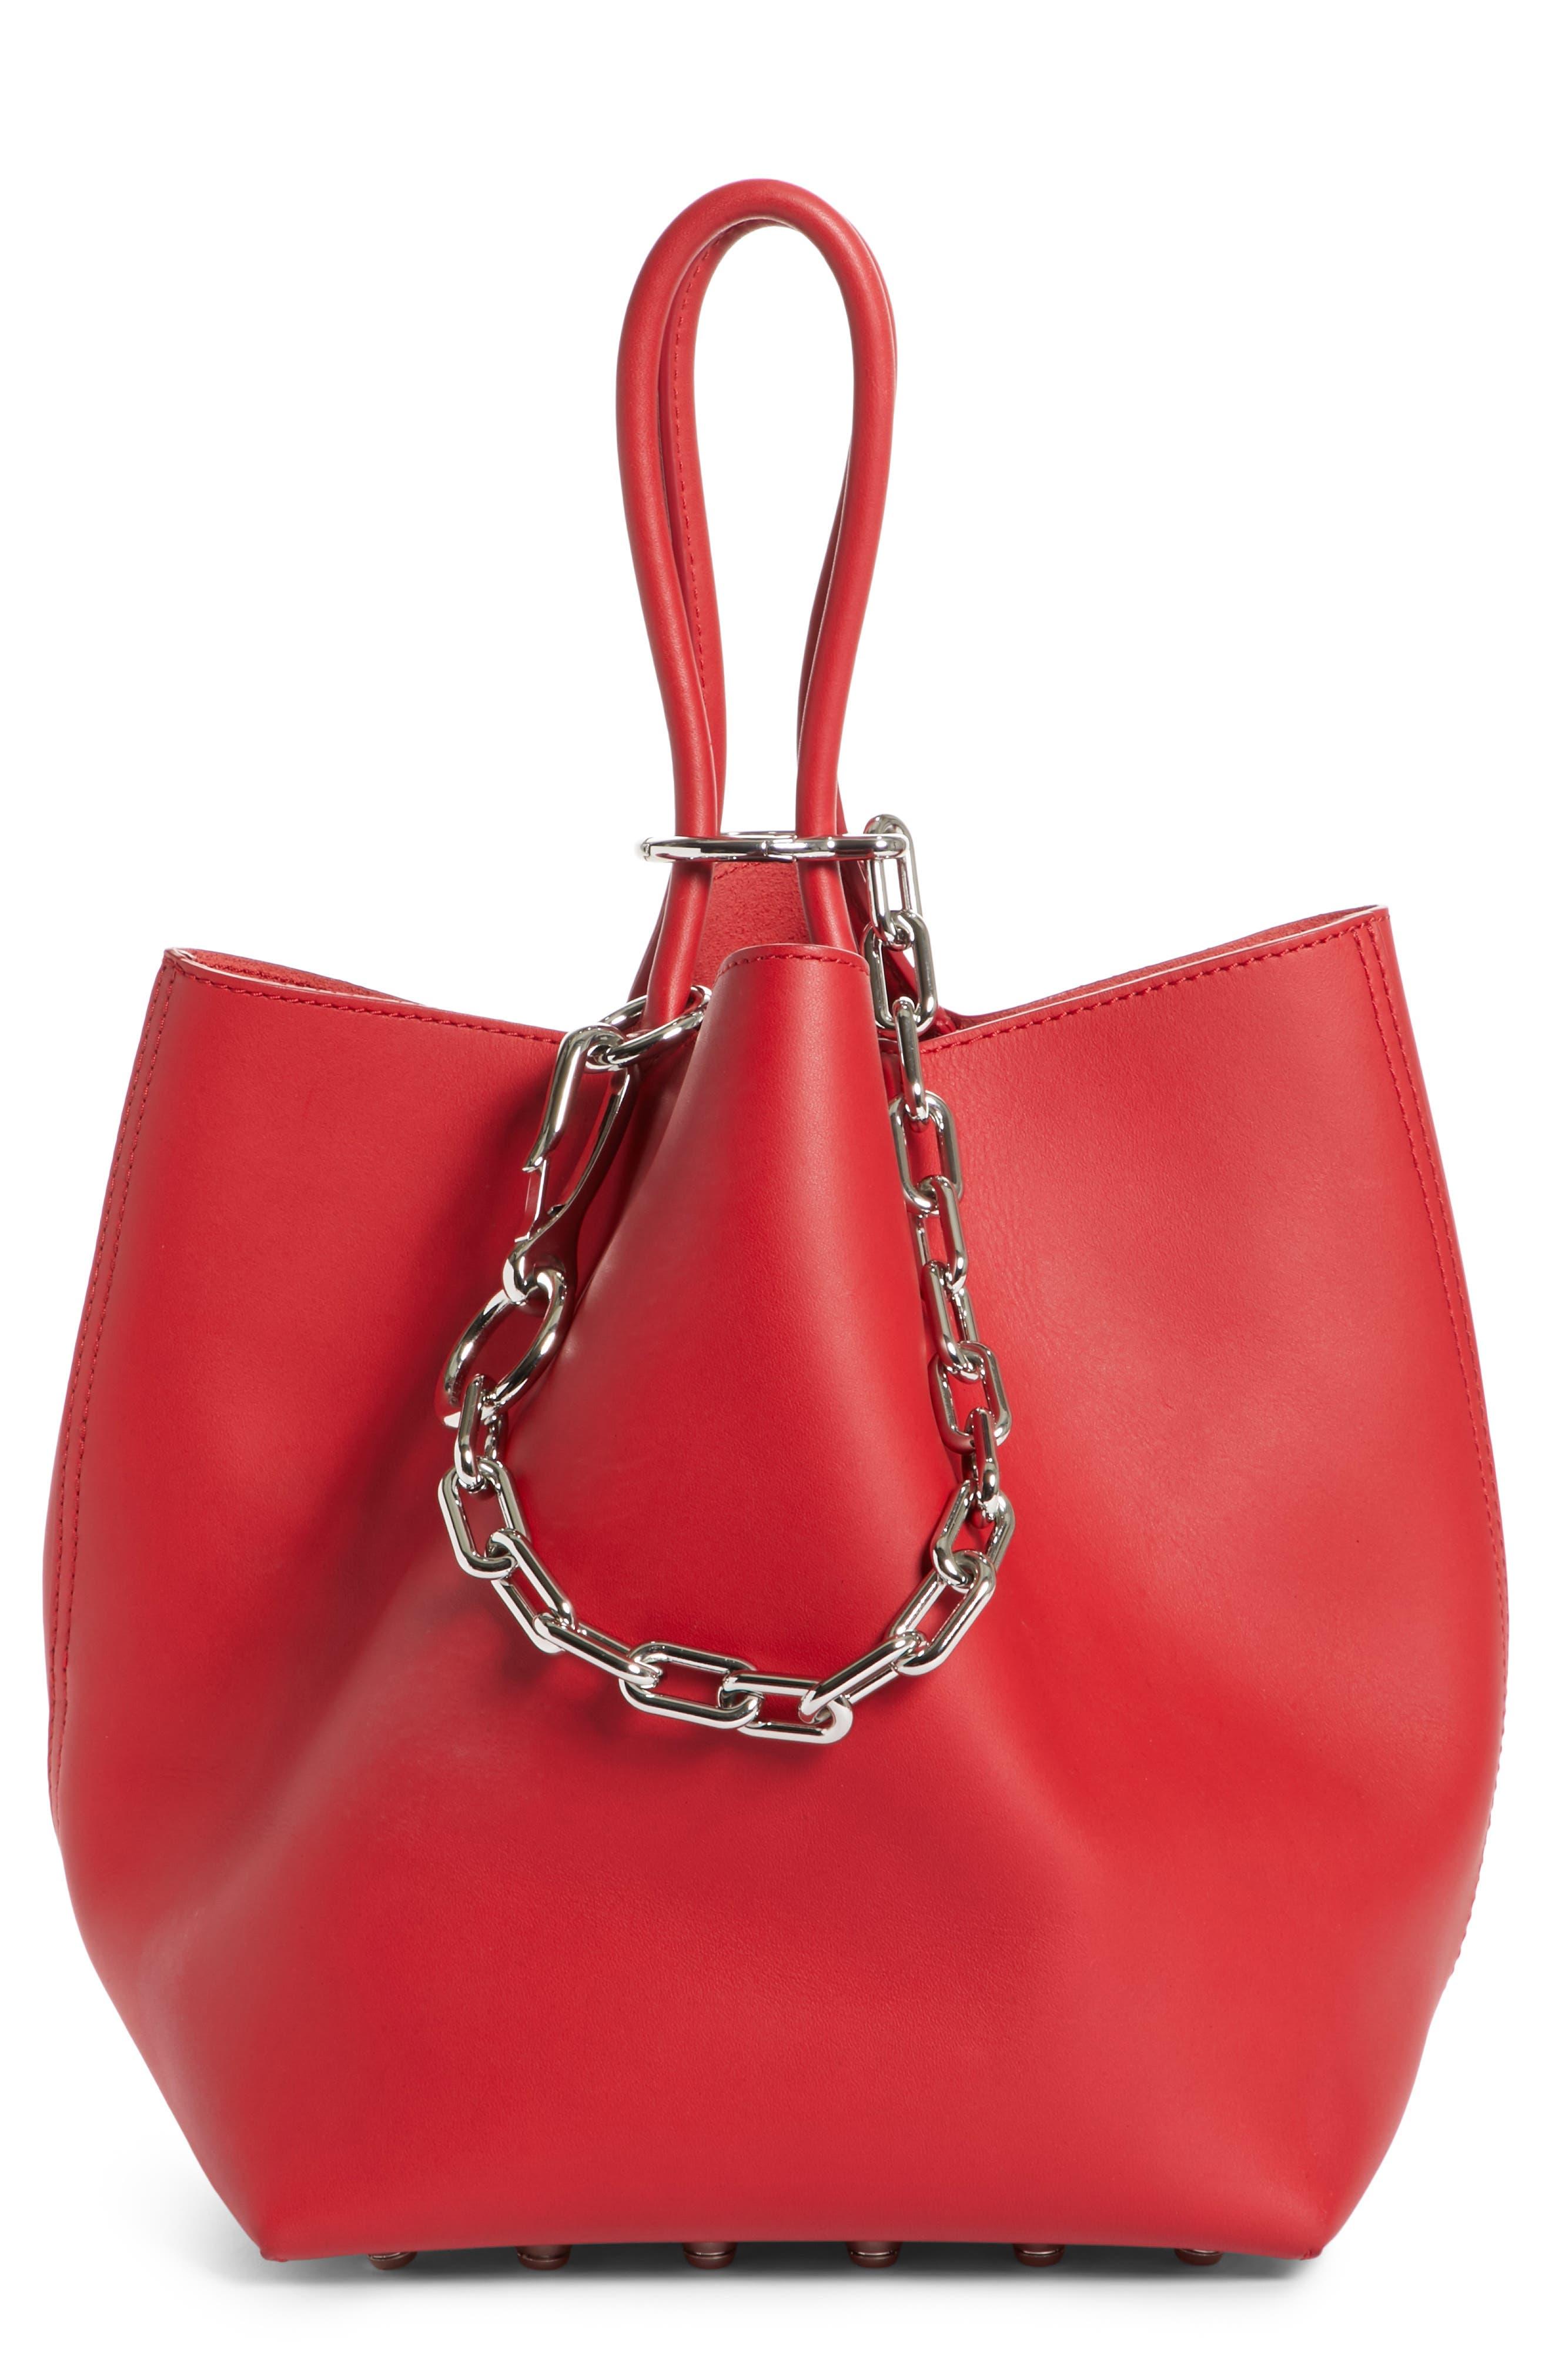 Alexander Wang Small Roxy Leather Bucket Bag